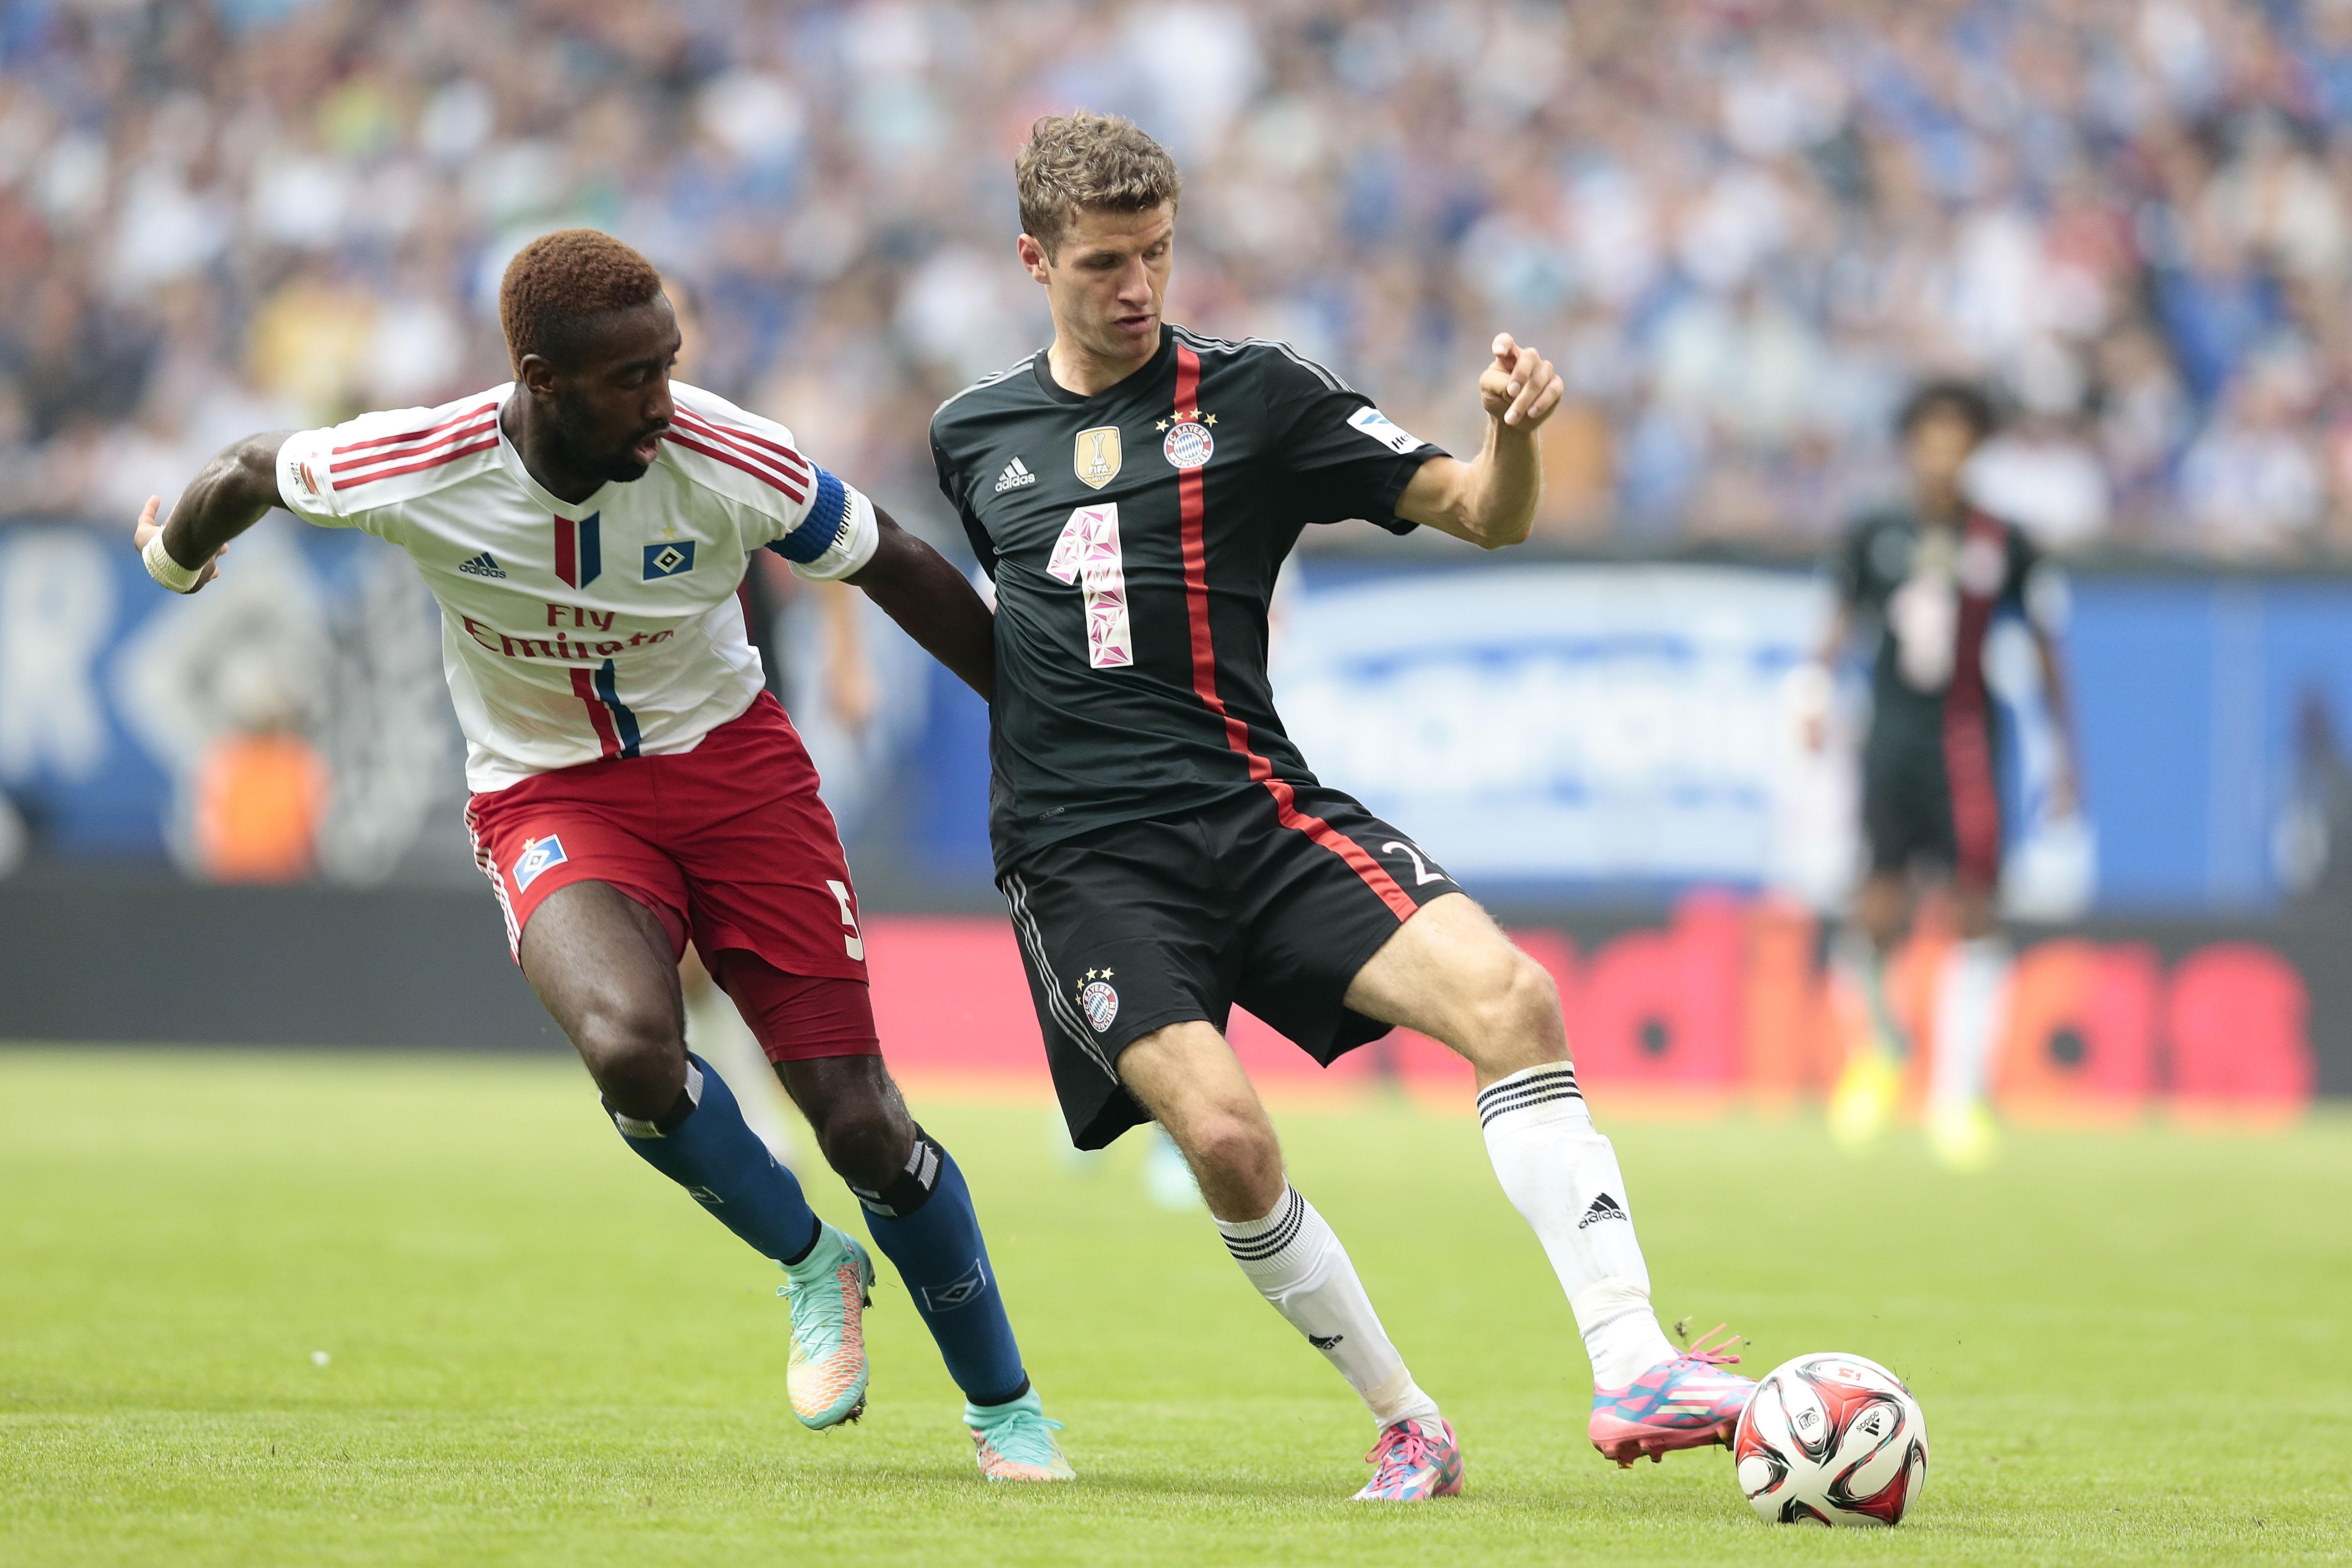 Live-Stream 1. Bundesliga 4. Spieltag: Ergebnisse, Sonntag FSV Mainz vs Borussia Dortmund und 1. FC Köln vs Borussia M'gladbach